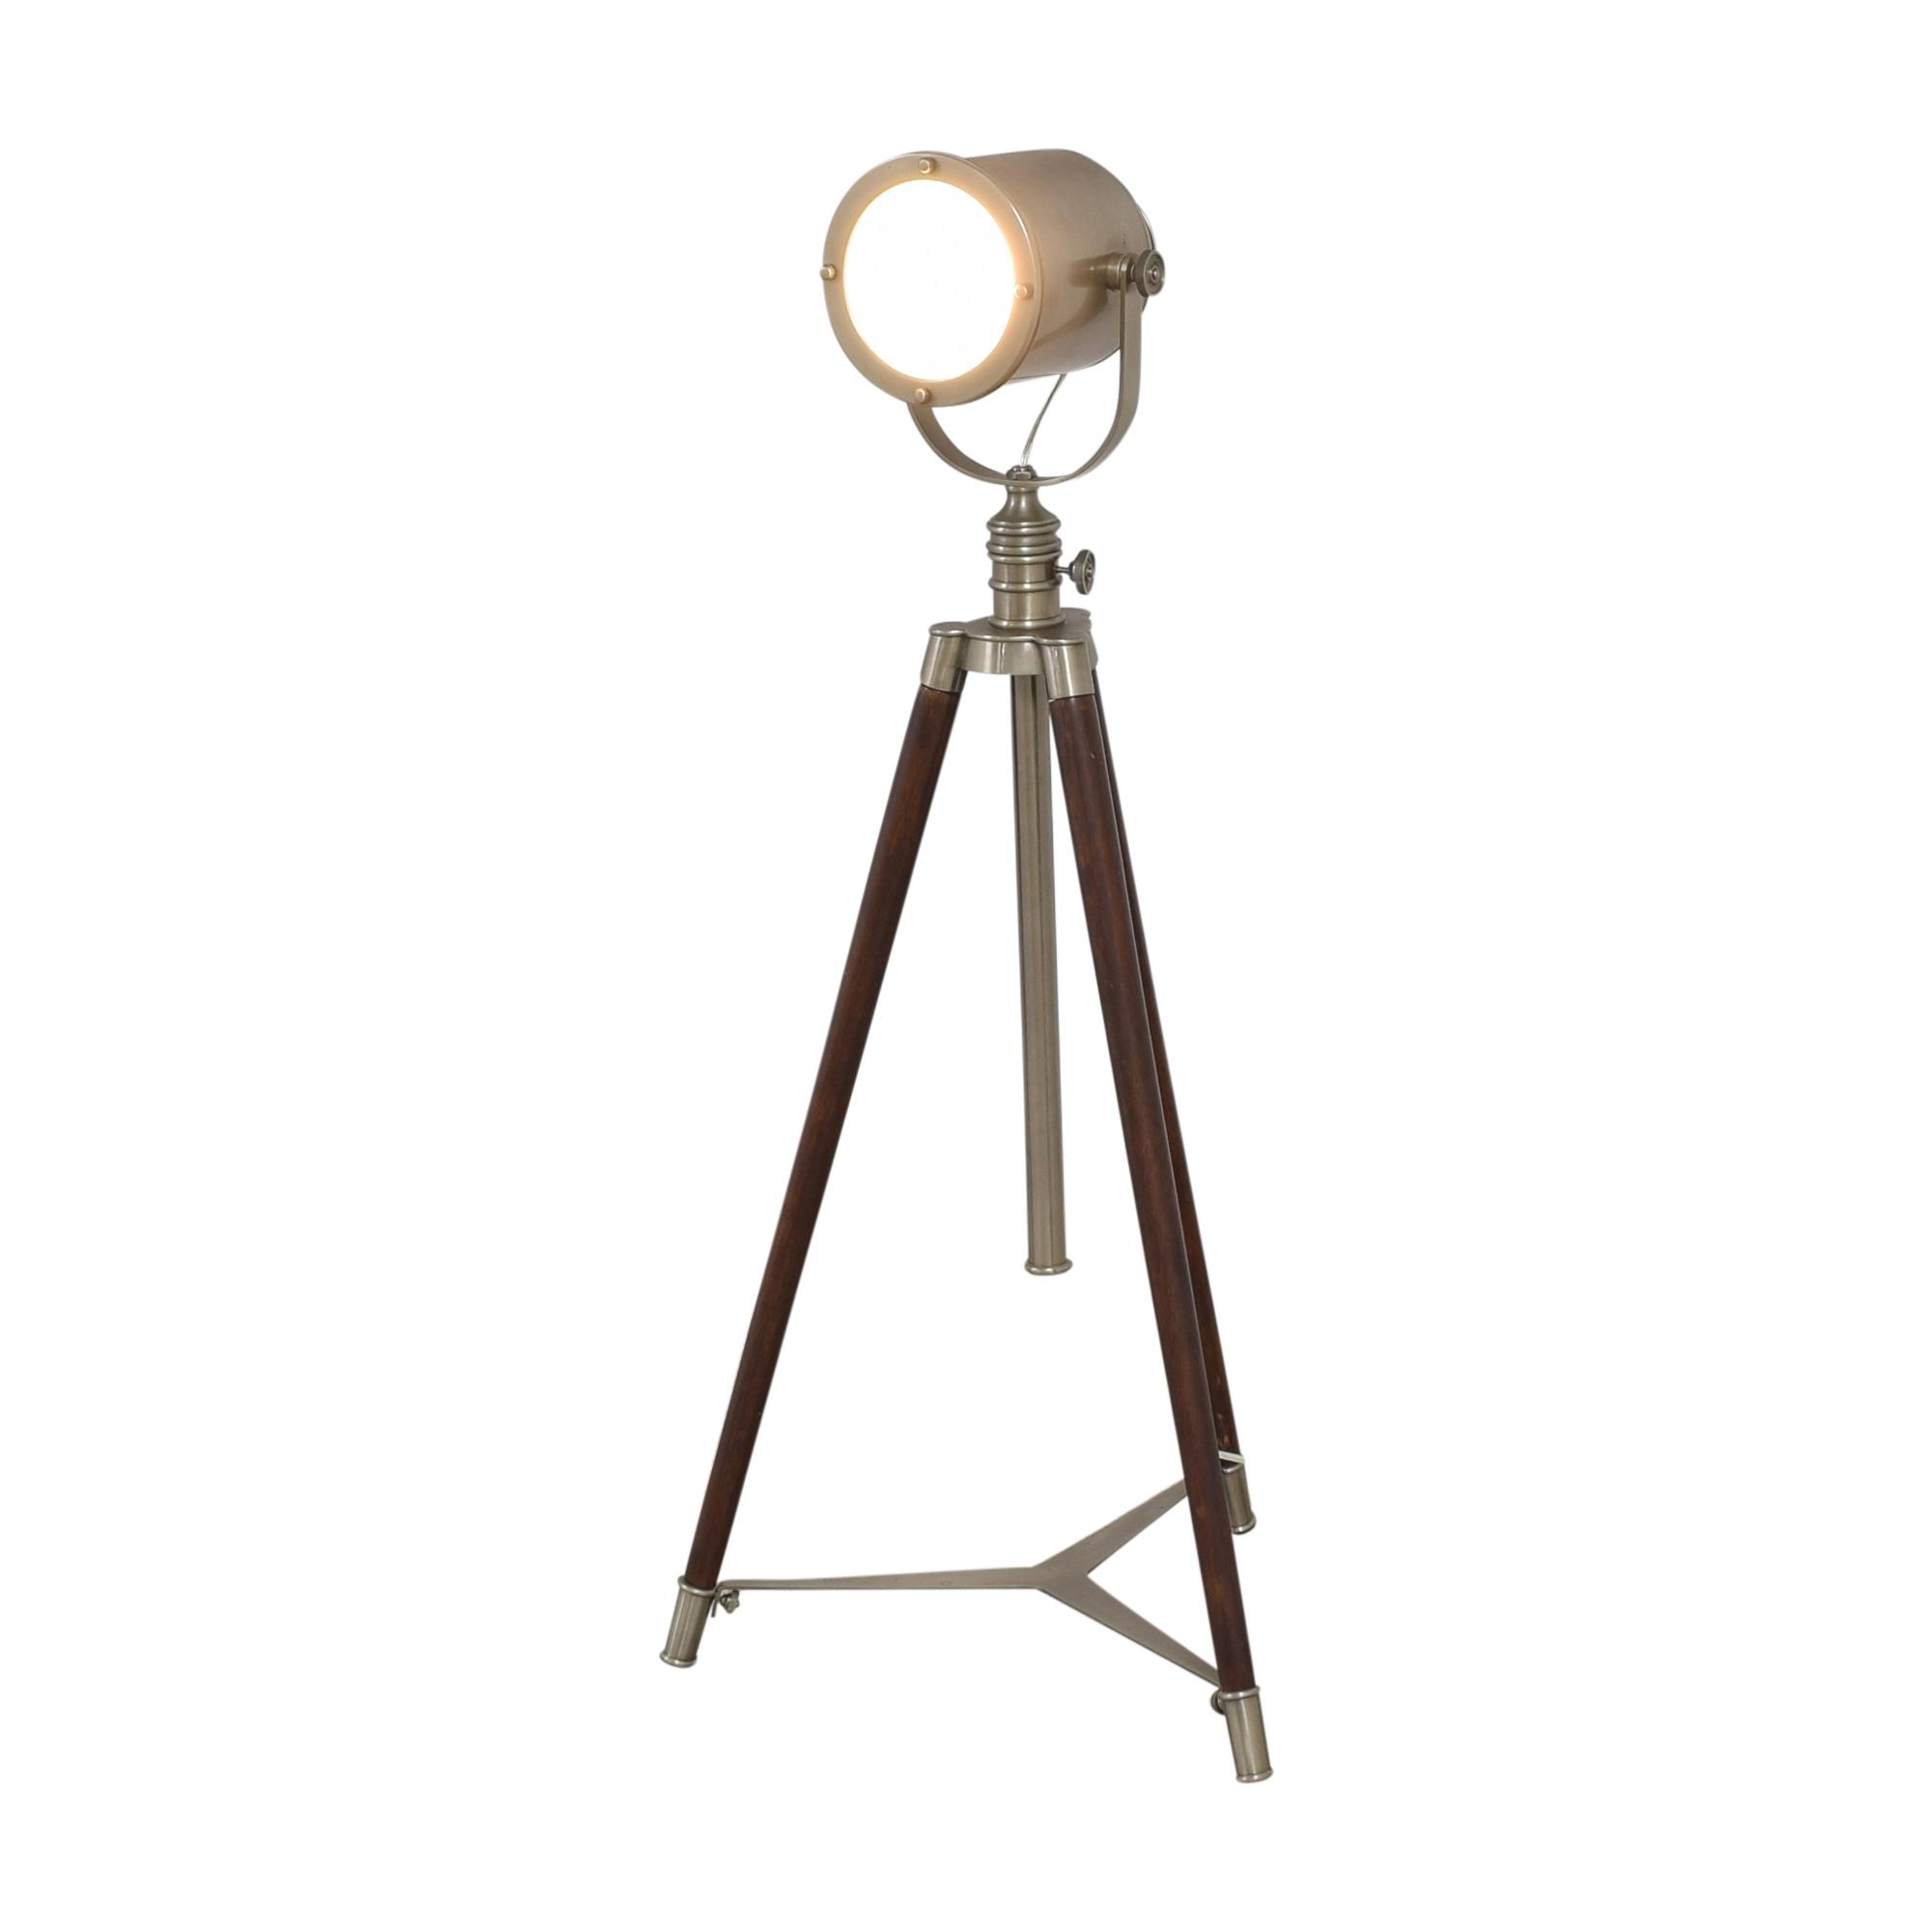 Pottery Barn Pottery Barn Photographer's Adjustable Tripod Floor Lamp brown & silver